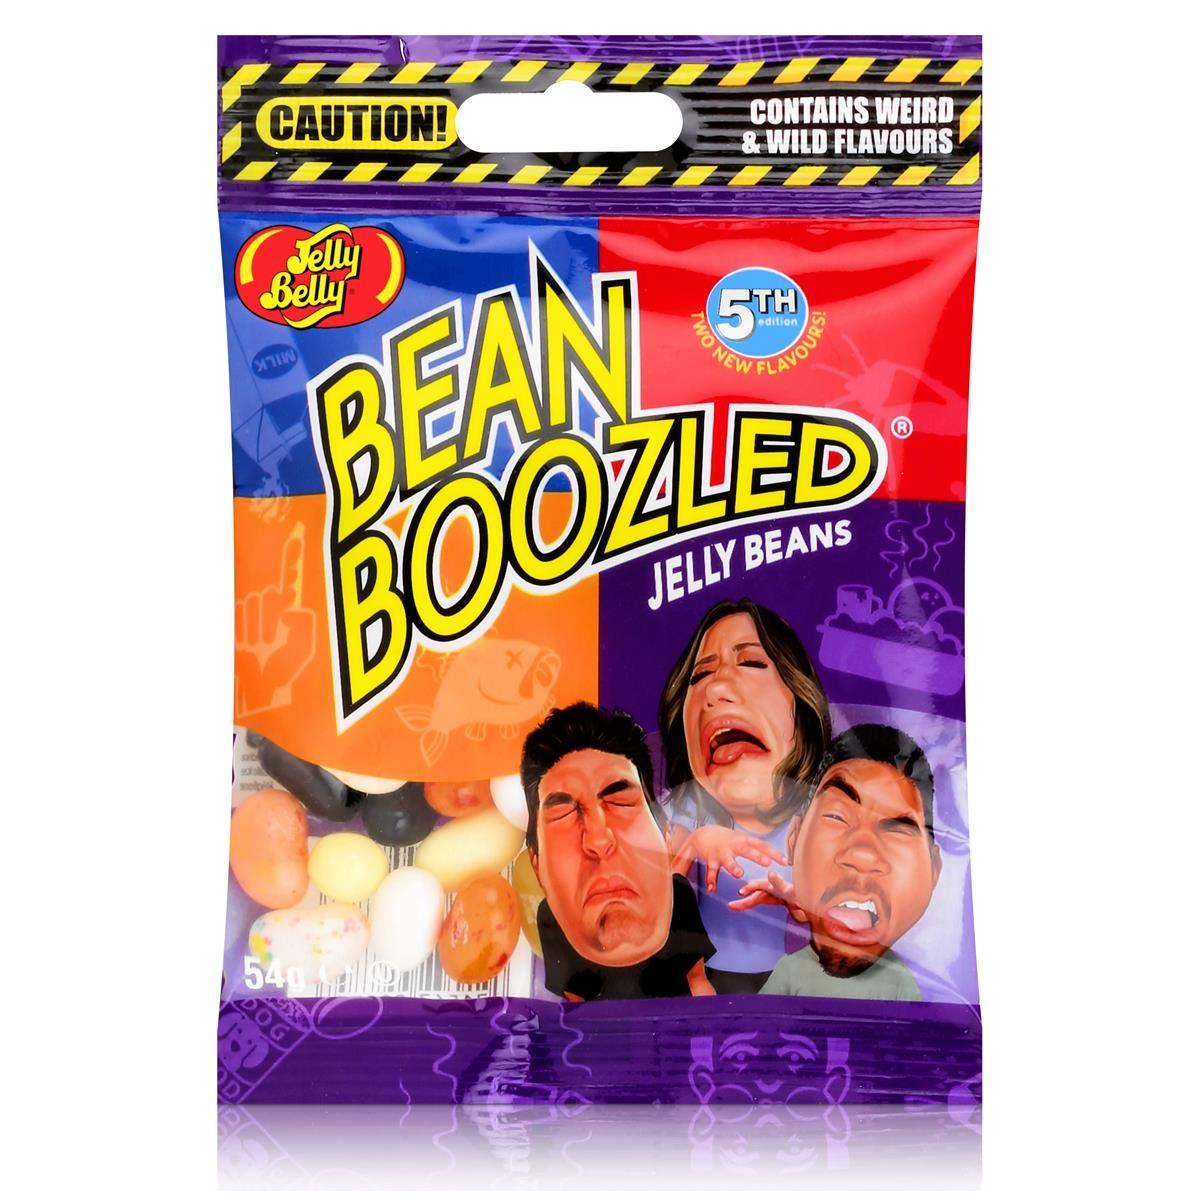 jelly belly beans sverige